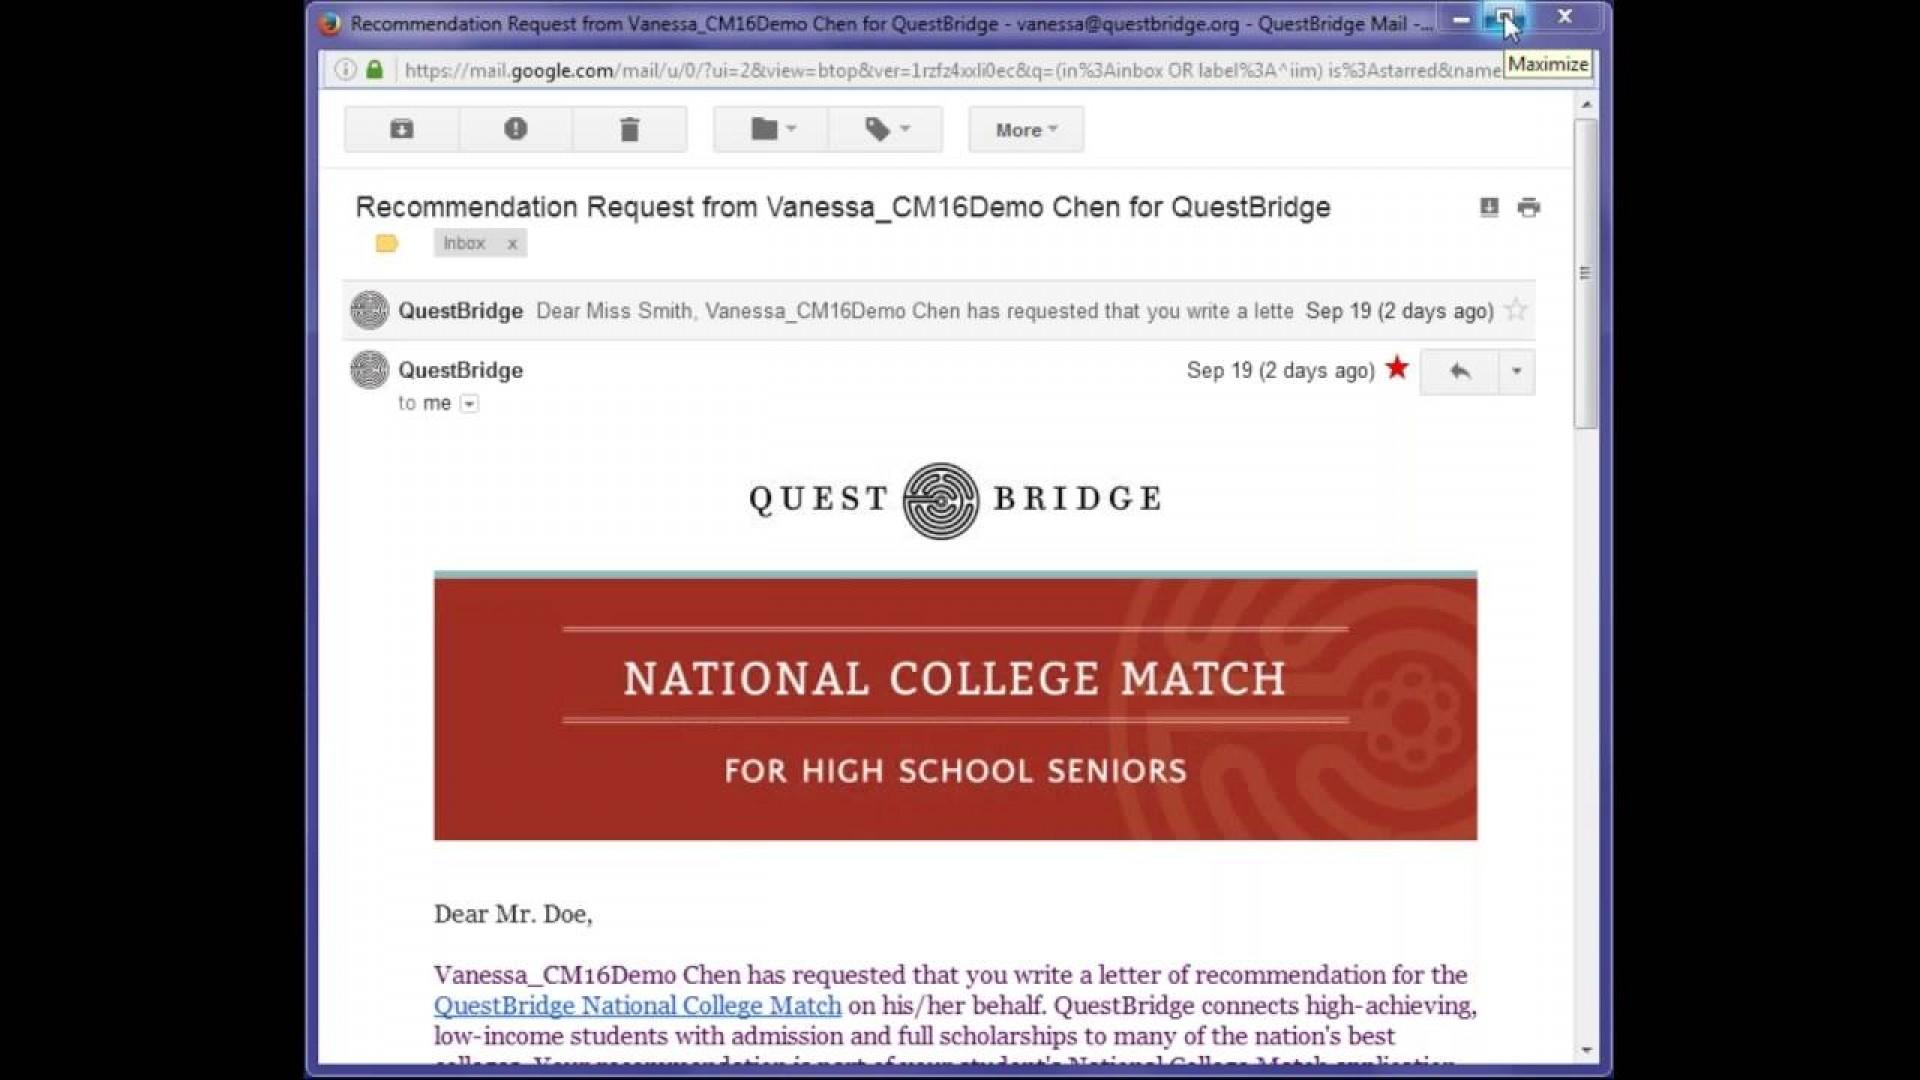 019 Essay Example Questbridge Stirring Essays Examples Finalist National College Match Prompts 1920